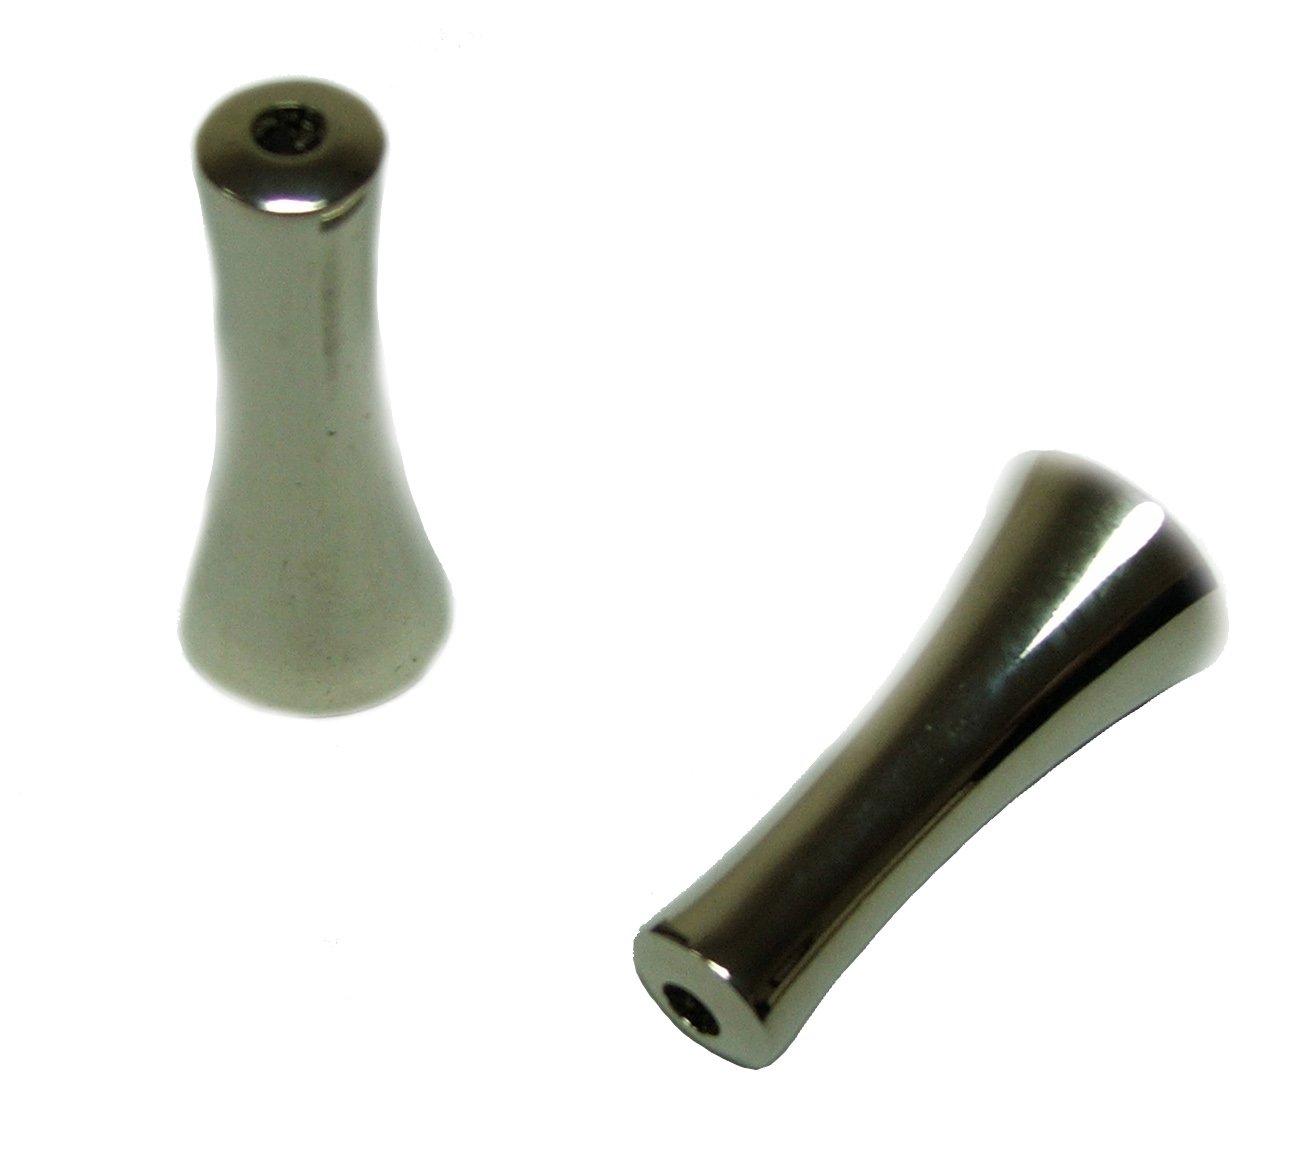 2 x Chrome Blind Acorn - Shower Light Cord Weight Pull